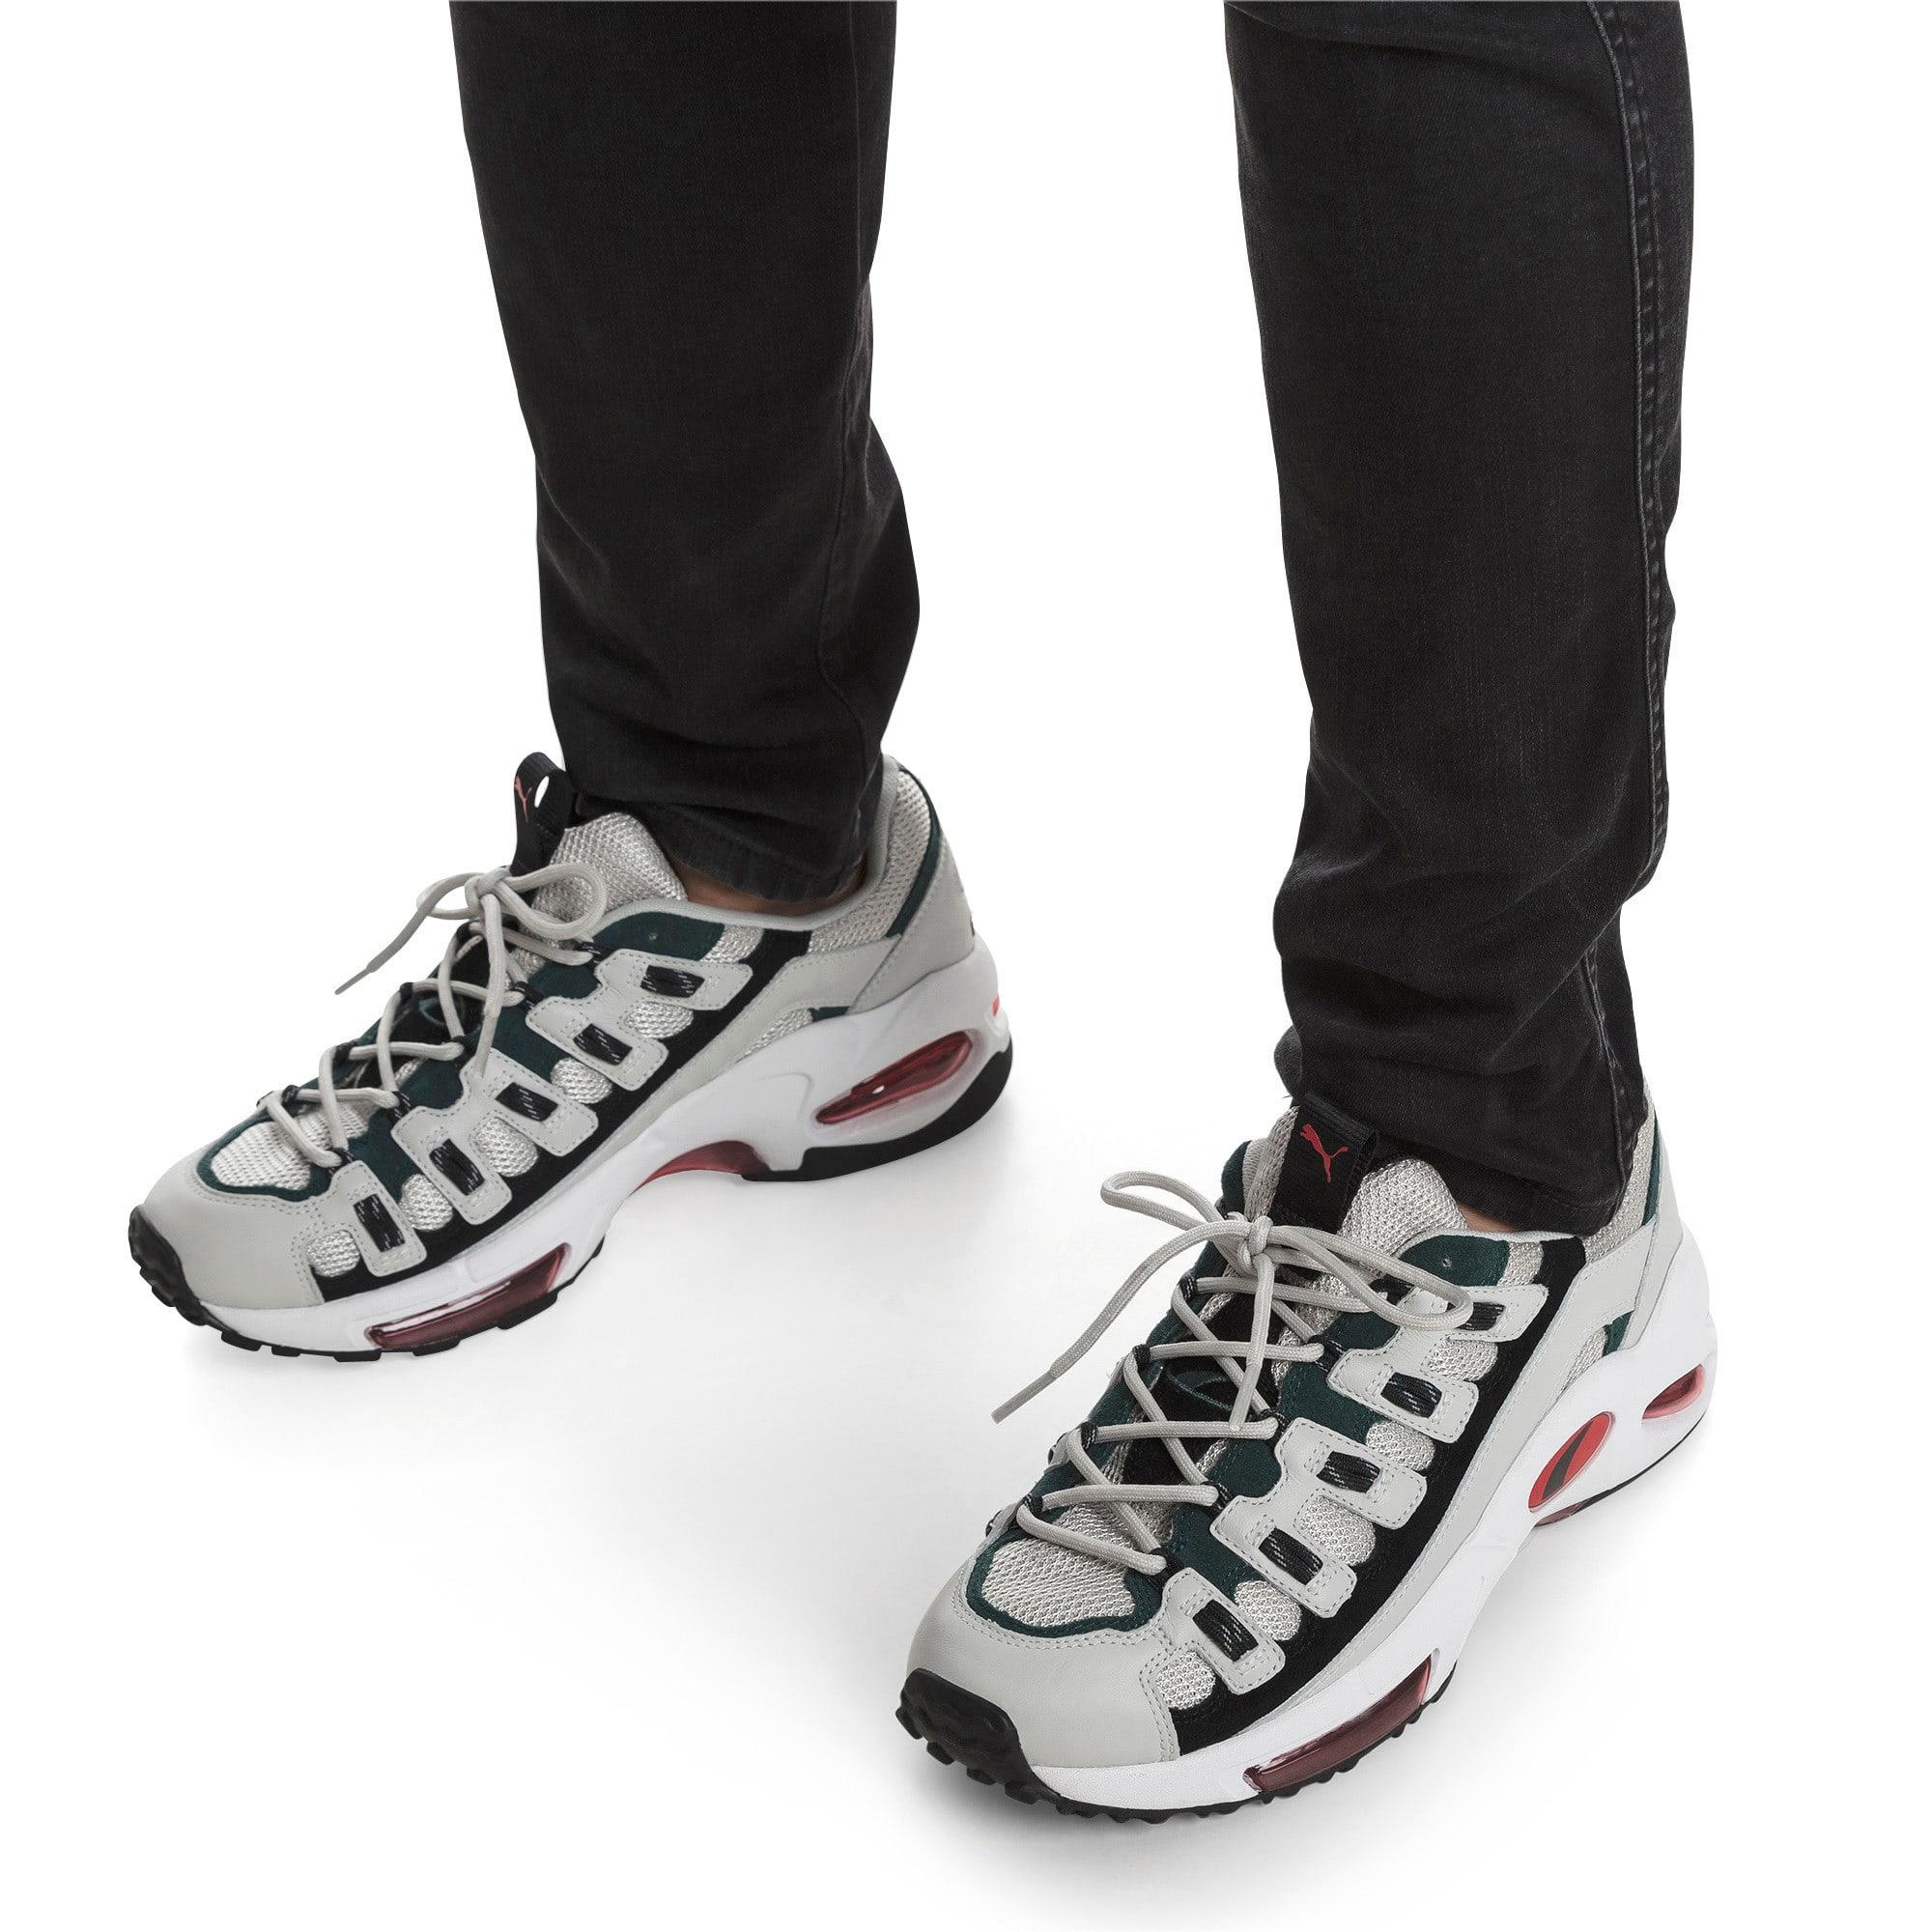 Thumbnail 7 of CELL Endura Sneakers, Glacier Gray-High Risk Red, medium